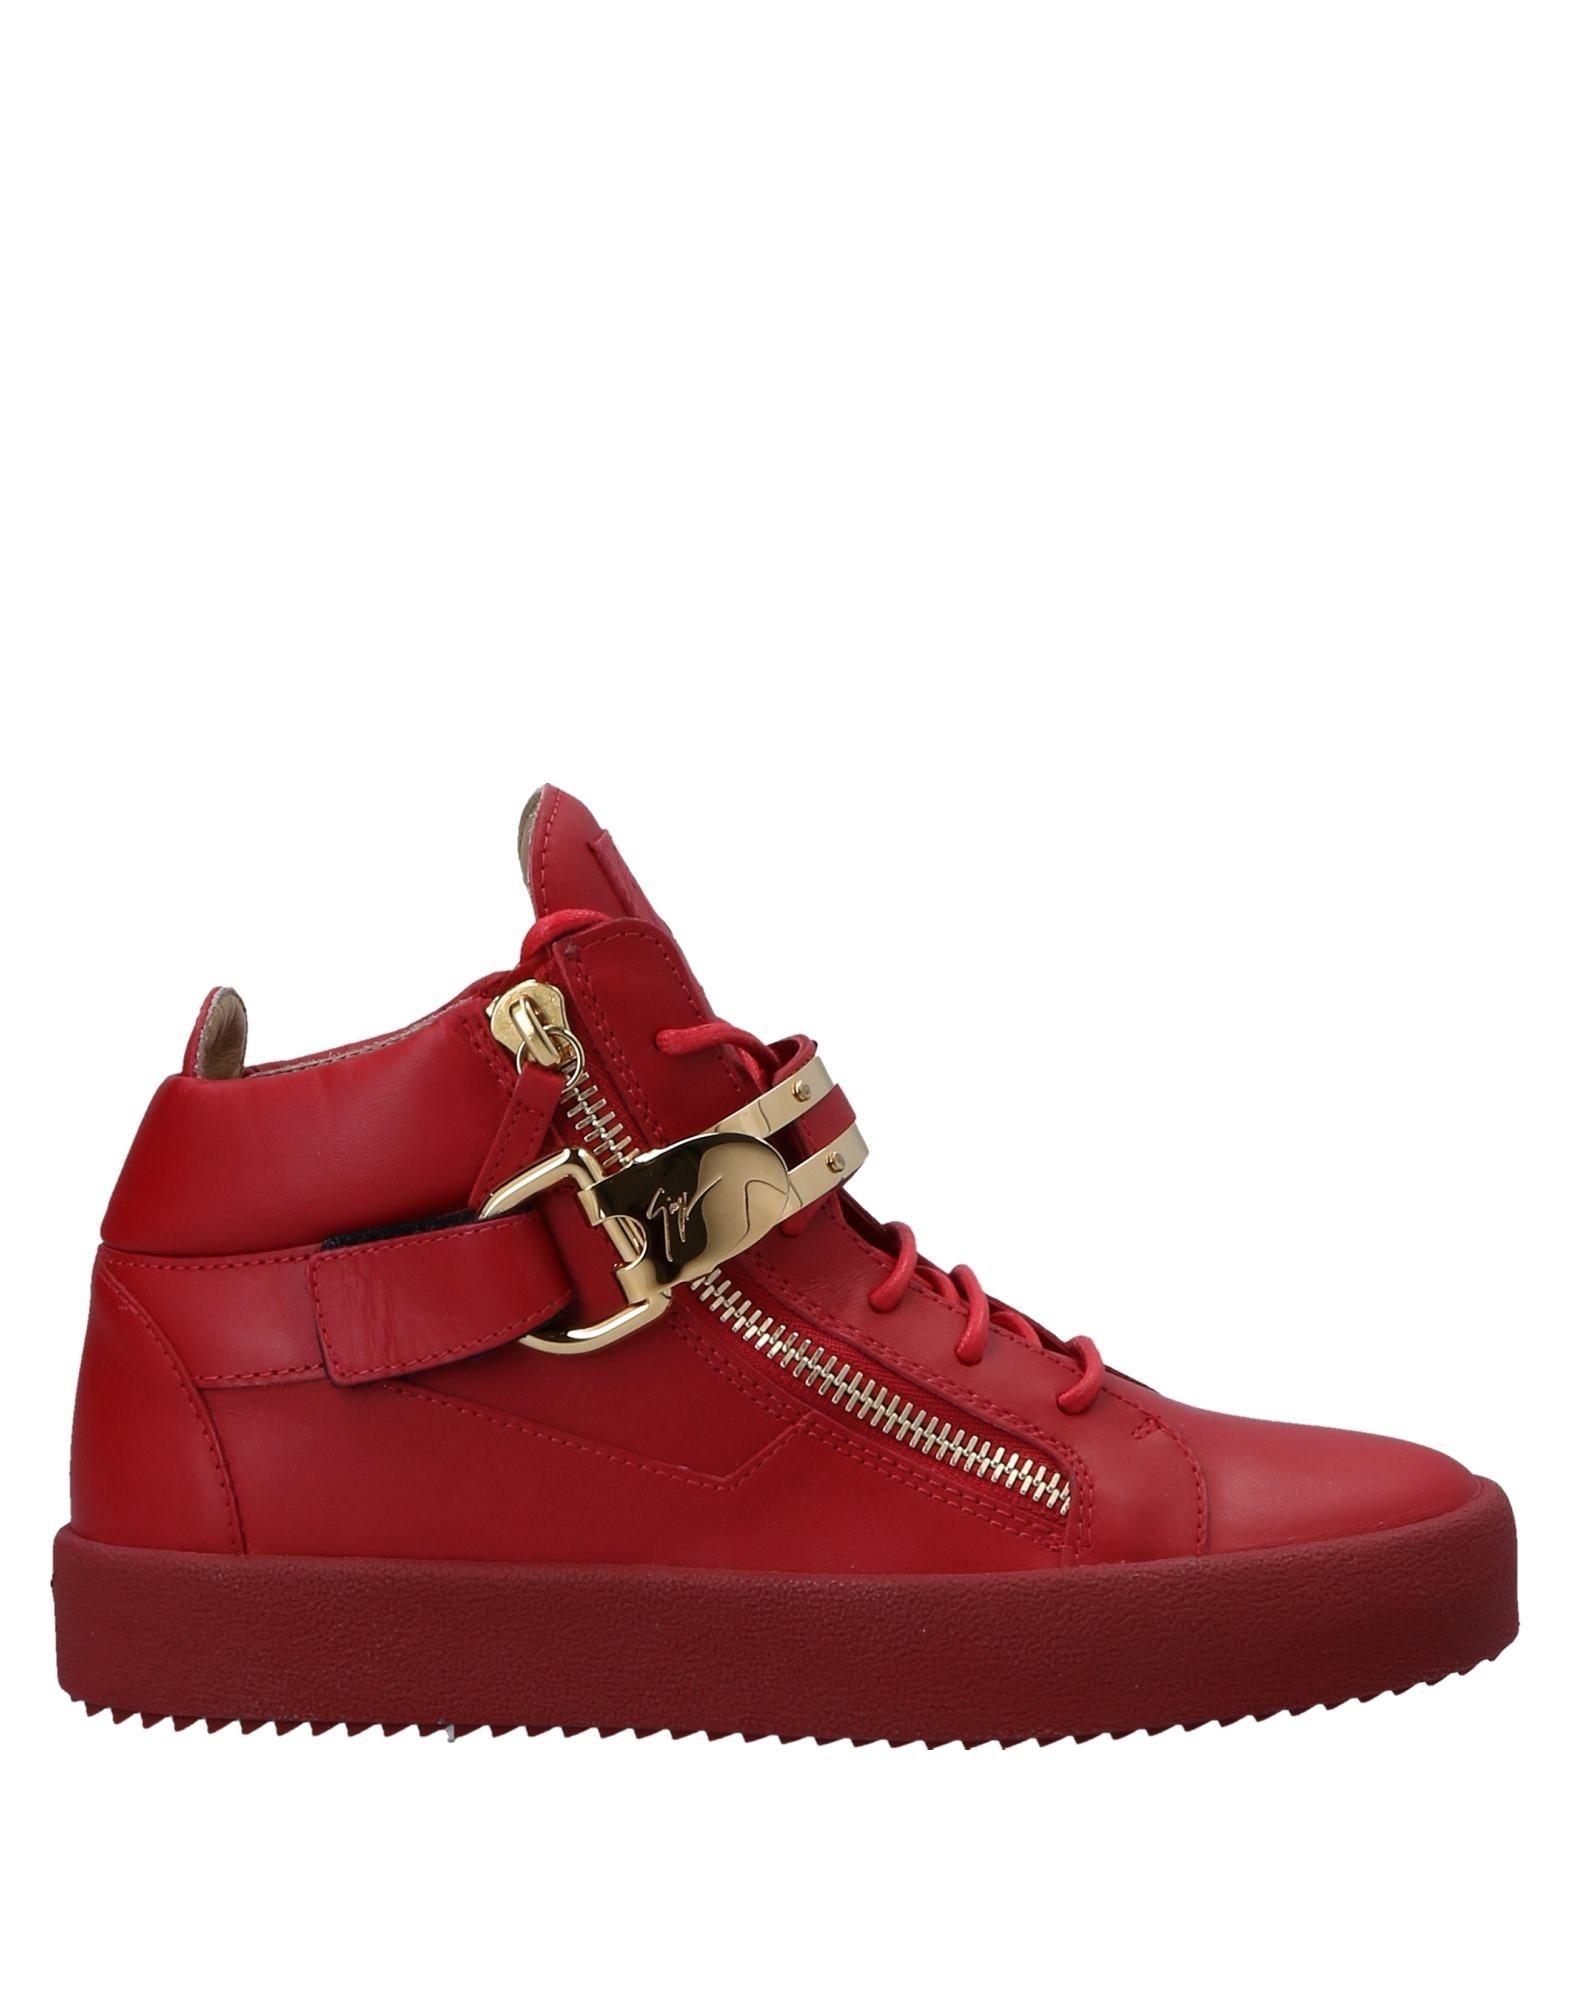 Sneakers Giuseppe Zanotti Homme - Sneakers Giuseppe Zanotti  Rouge Réduction de prix saisonnier, remise